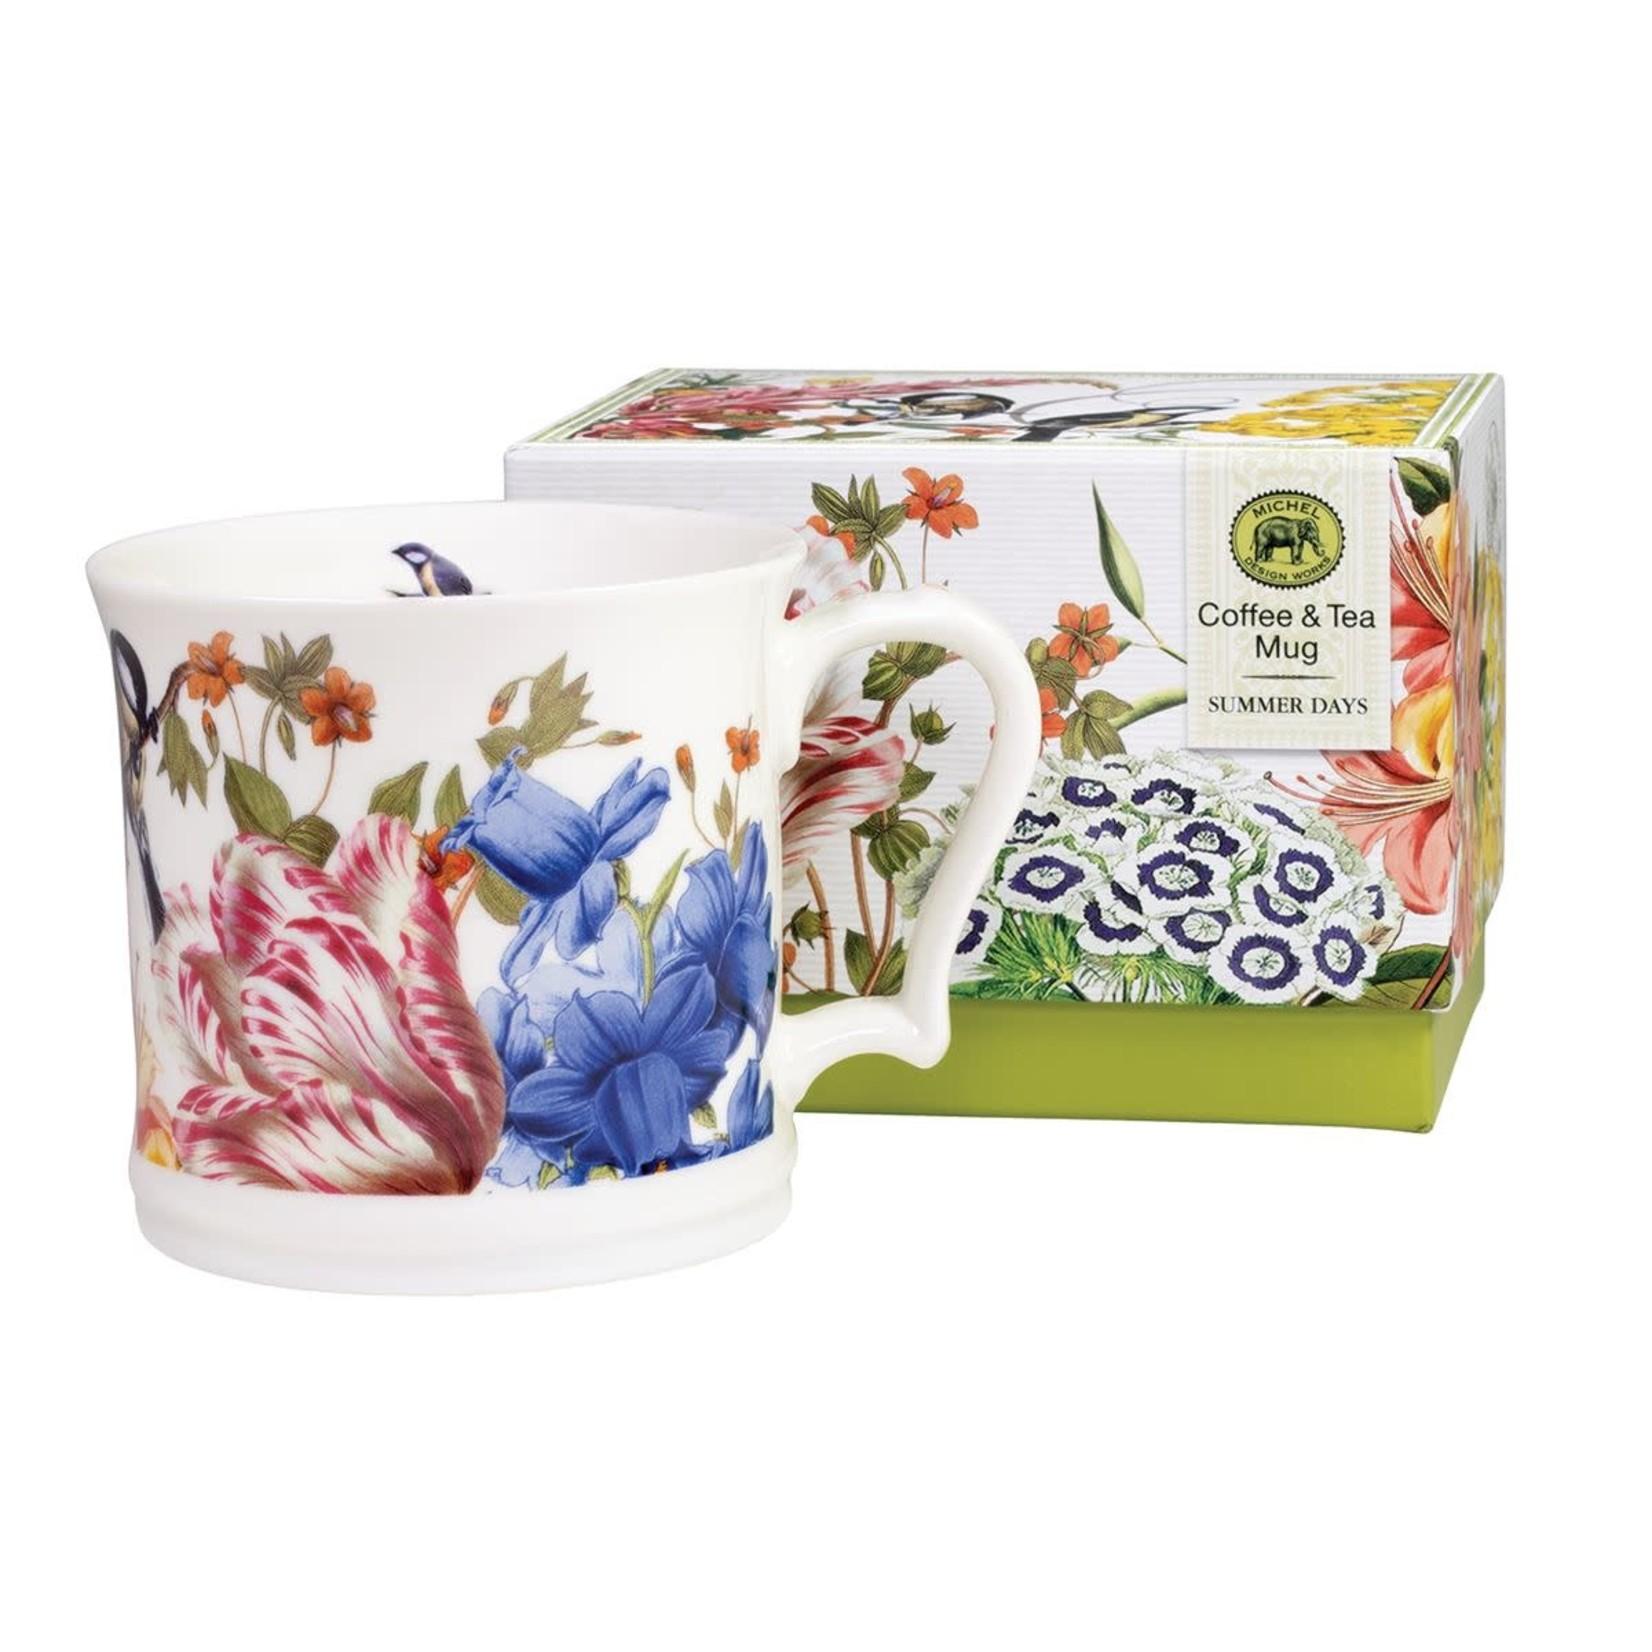 Michel Design Works Summer Days Coffee & Tea Mug